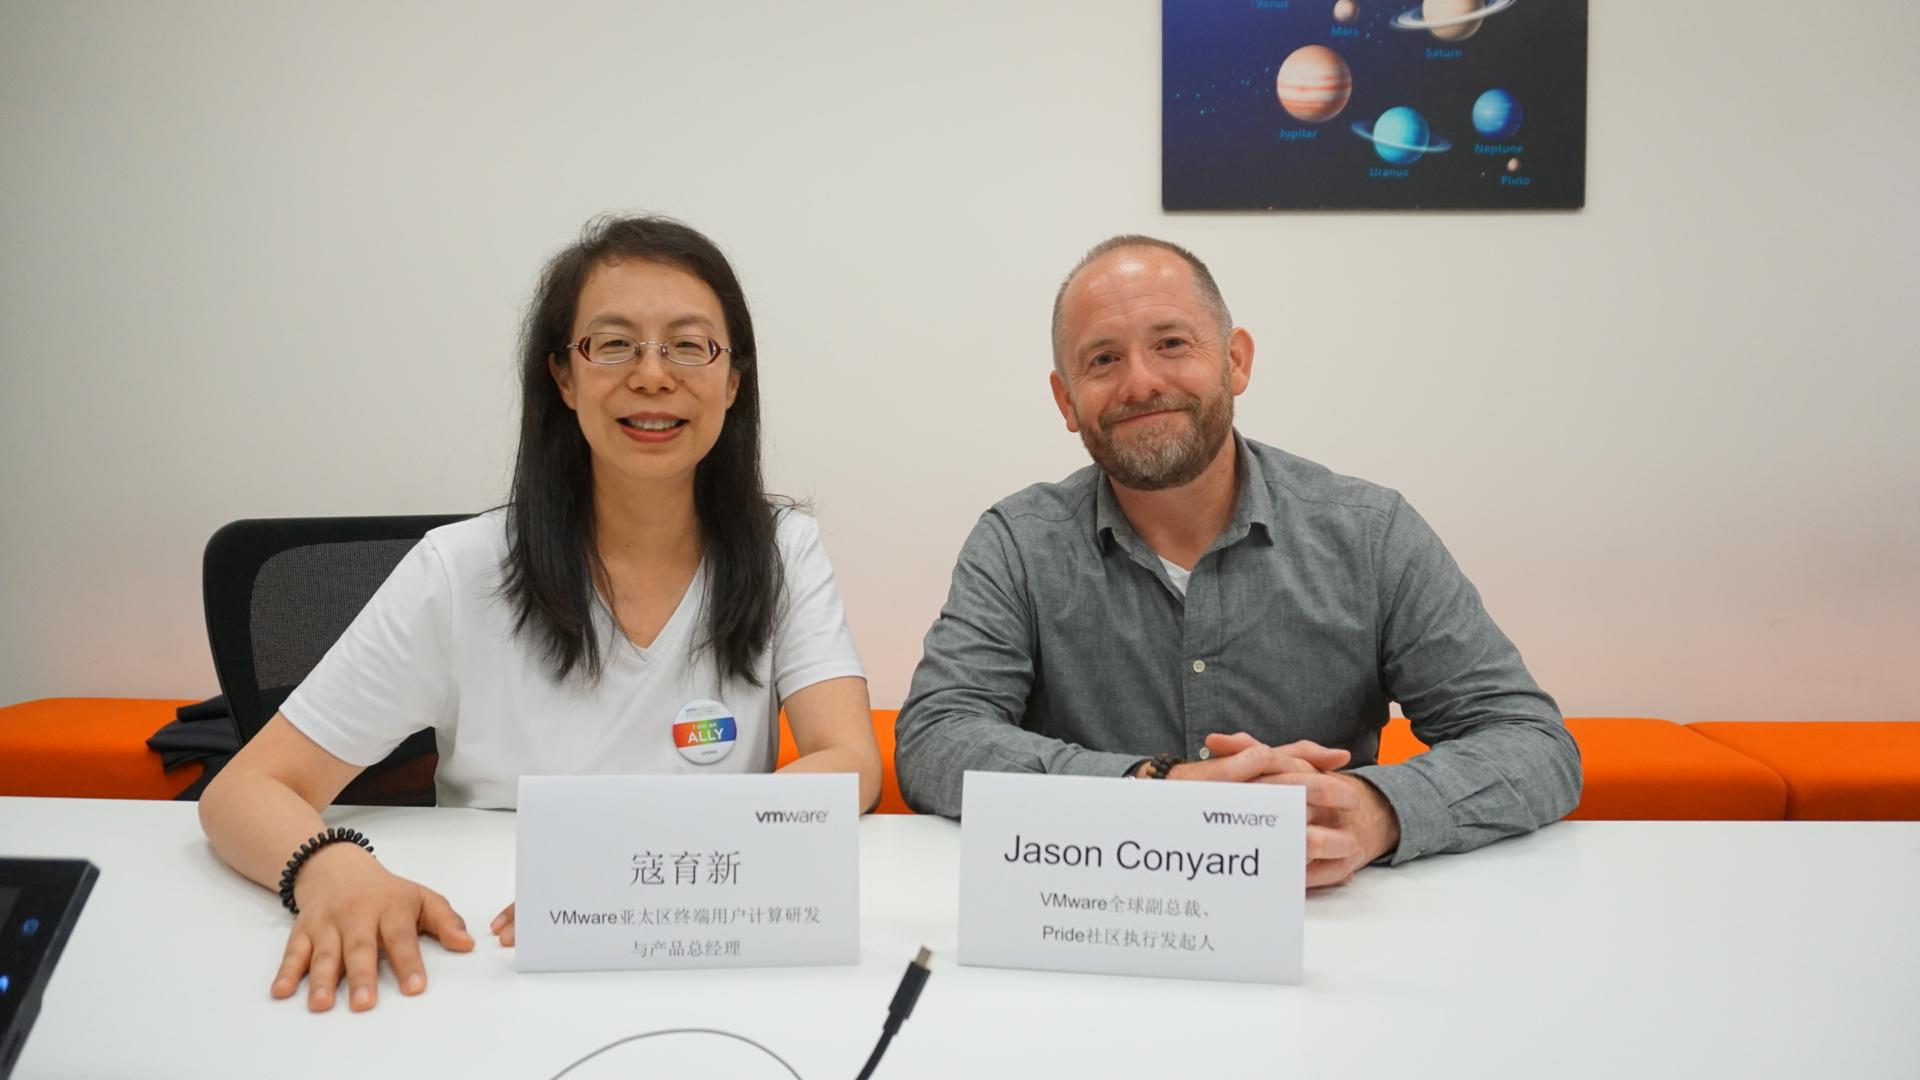 VMware全球副总裁:多元文化提升企业创新力